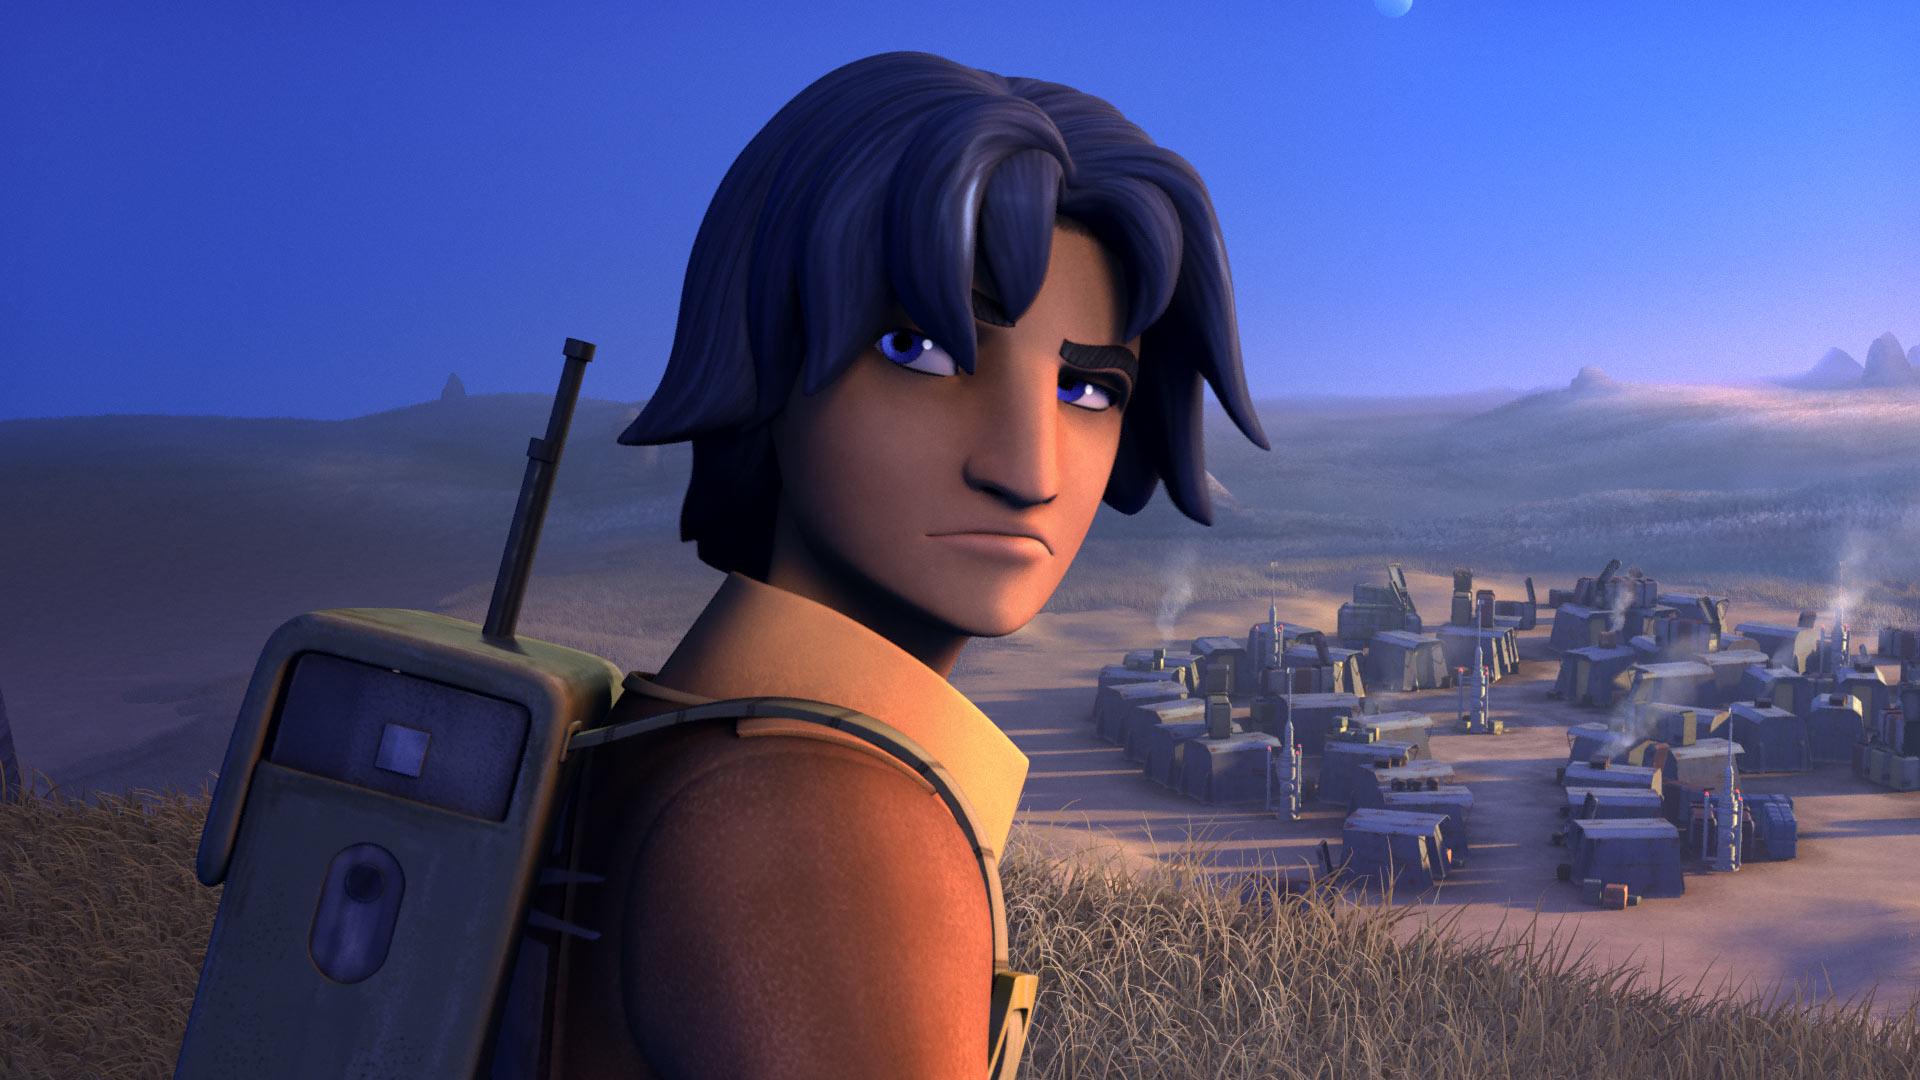 Details info of the Star Wars Rebels Ezra Bridger